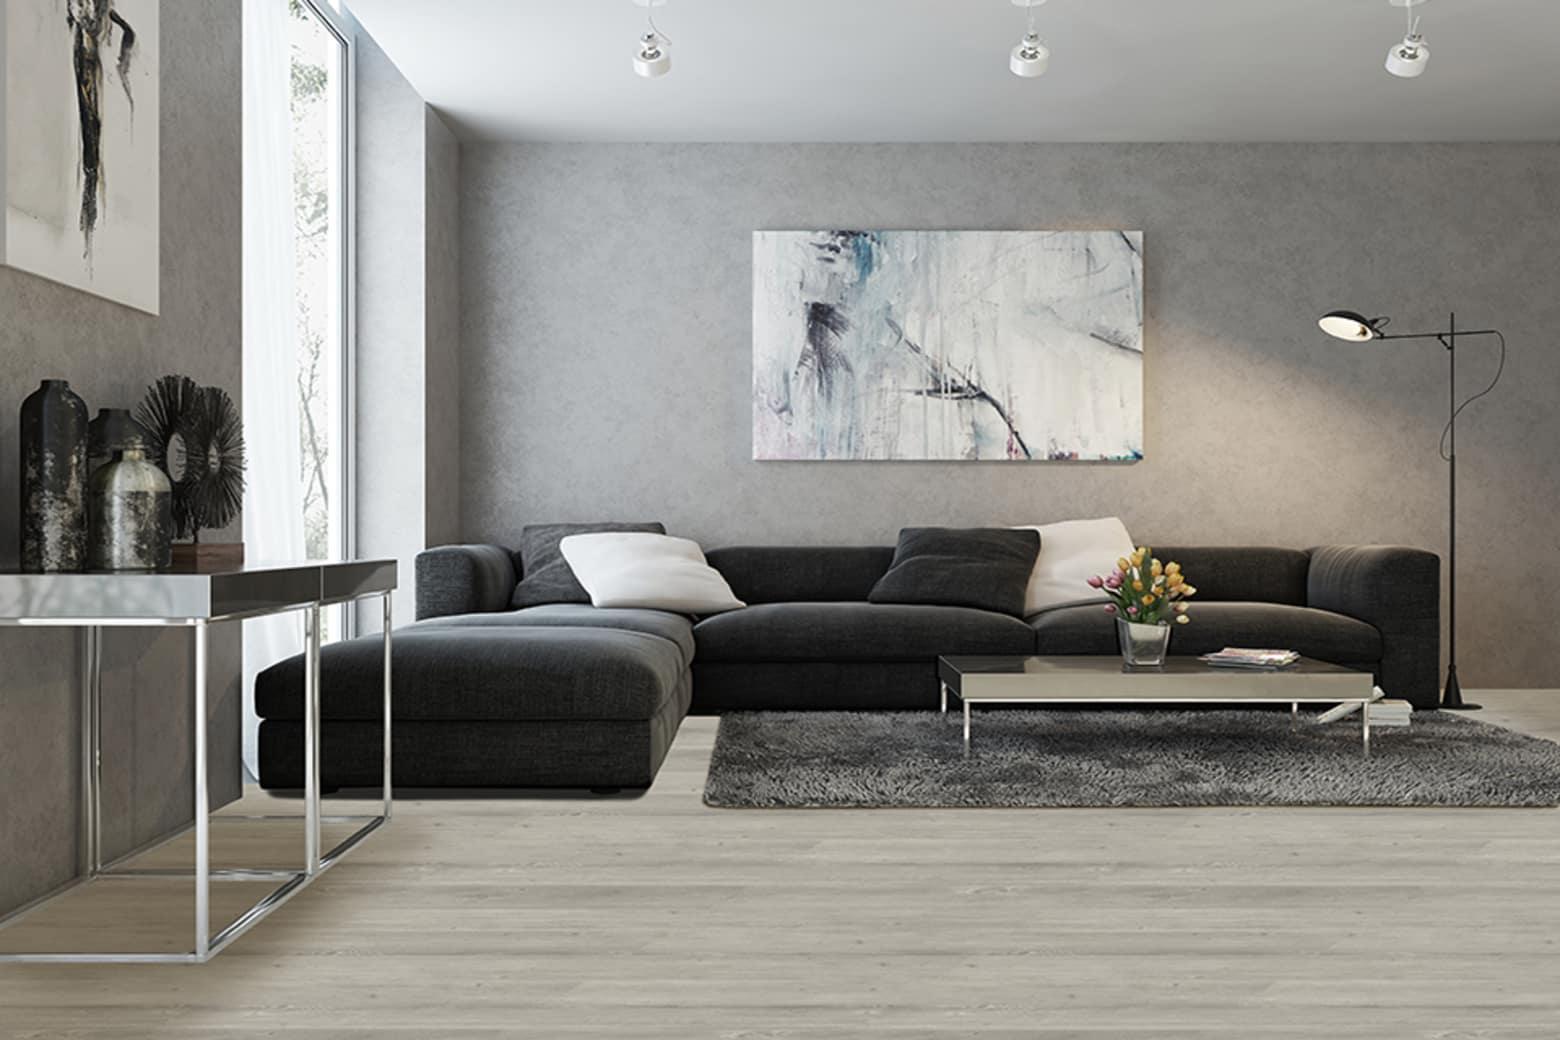 Luxury Click Vinyl Flooring Br Grey Oiled Oak 5mm By 169mm By 1210mm